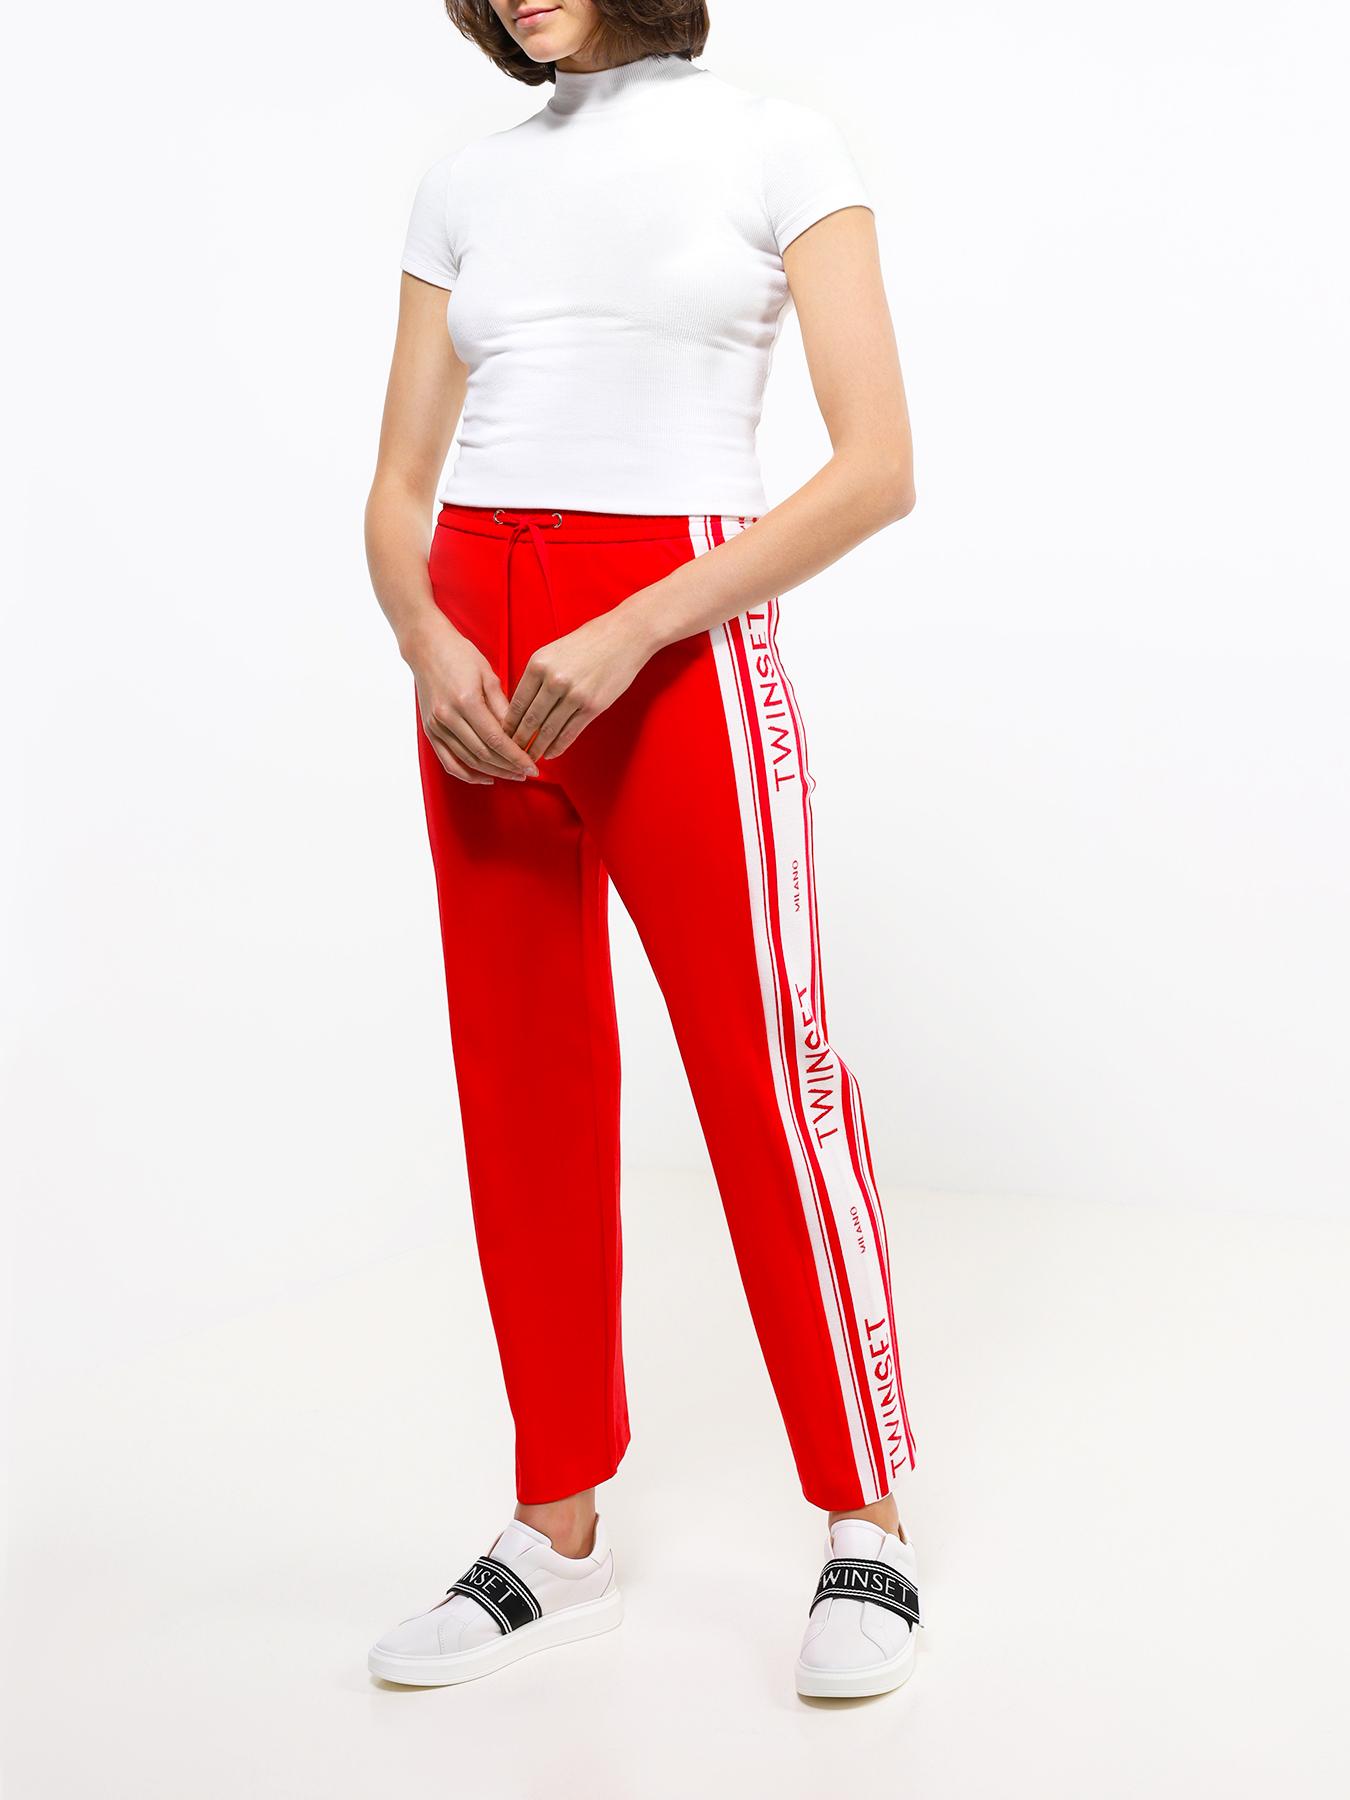 Брюки TWINSET Спортивные брюки брюки спортивные columbia columbia anytime outdoor boot cut pant